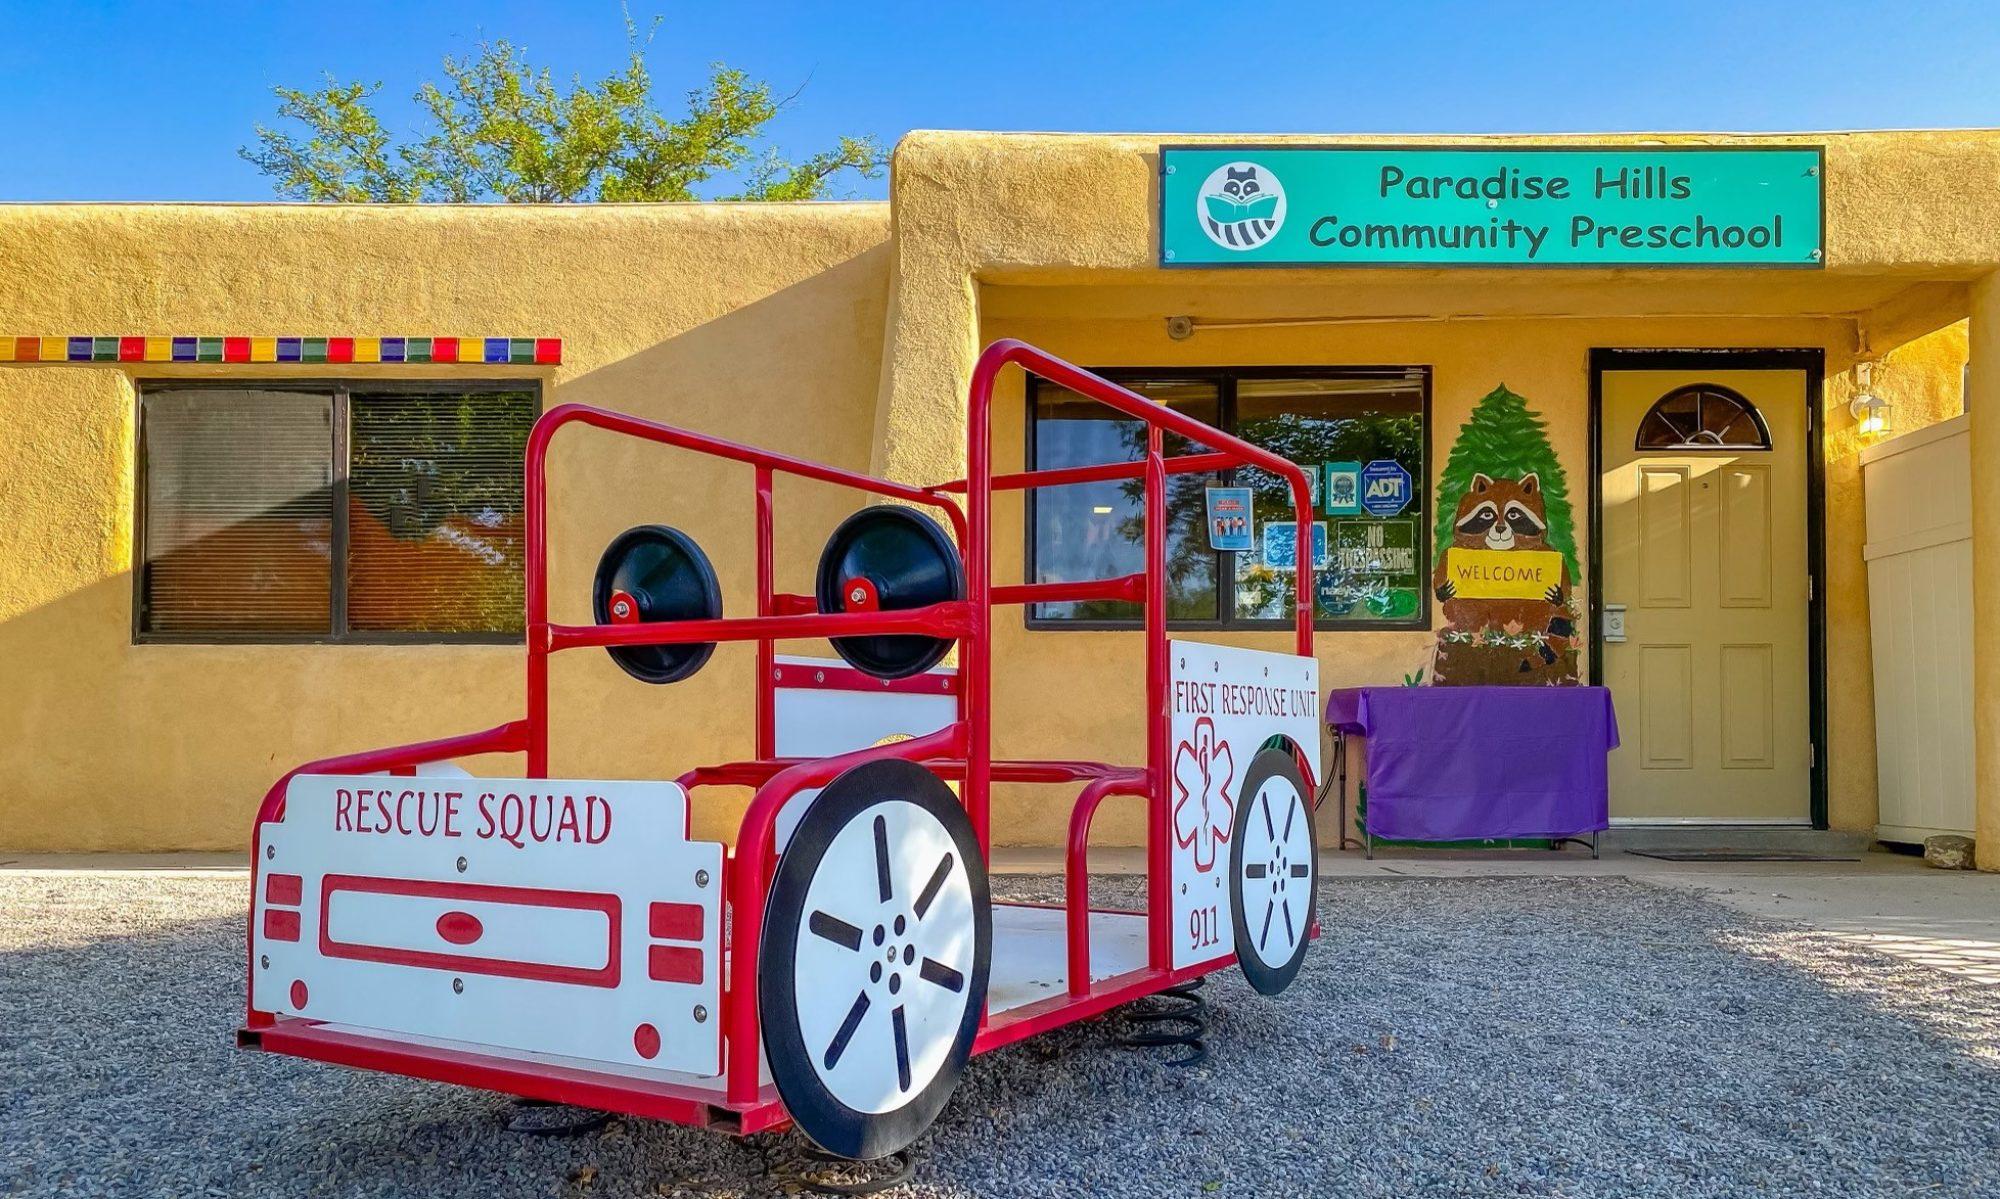 Paradise Hills Community Preschool